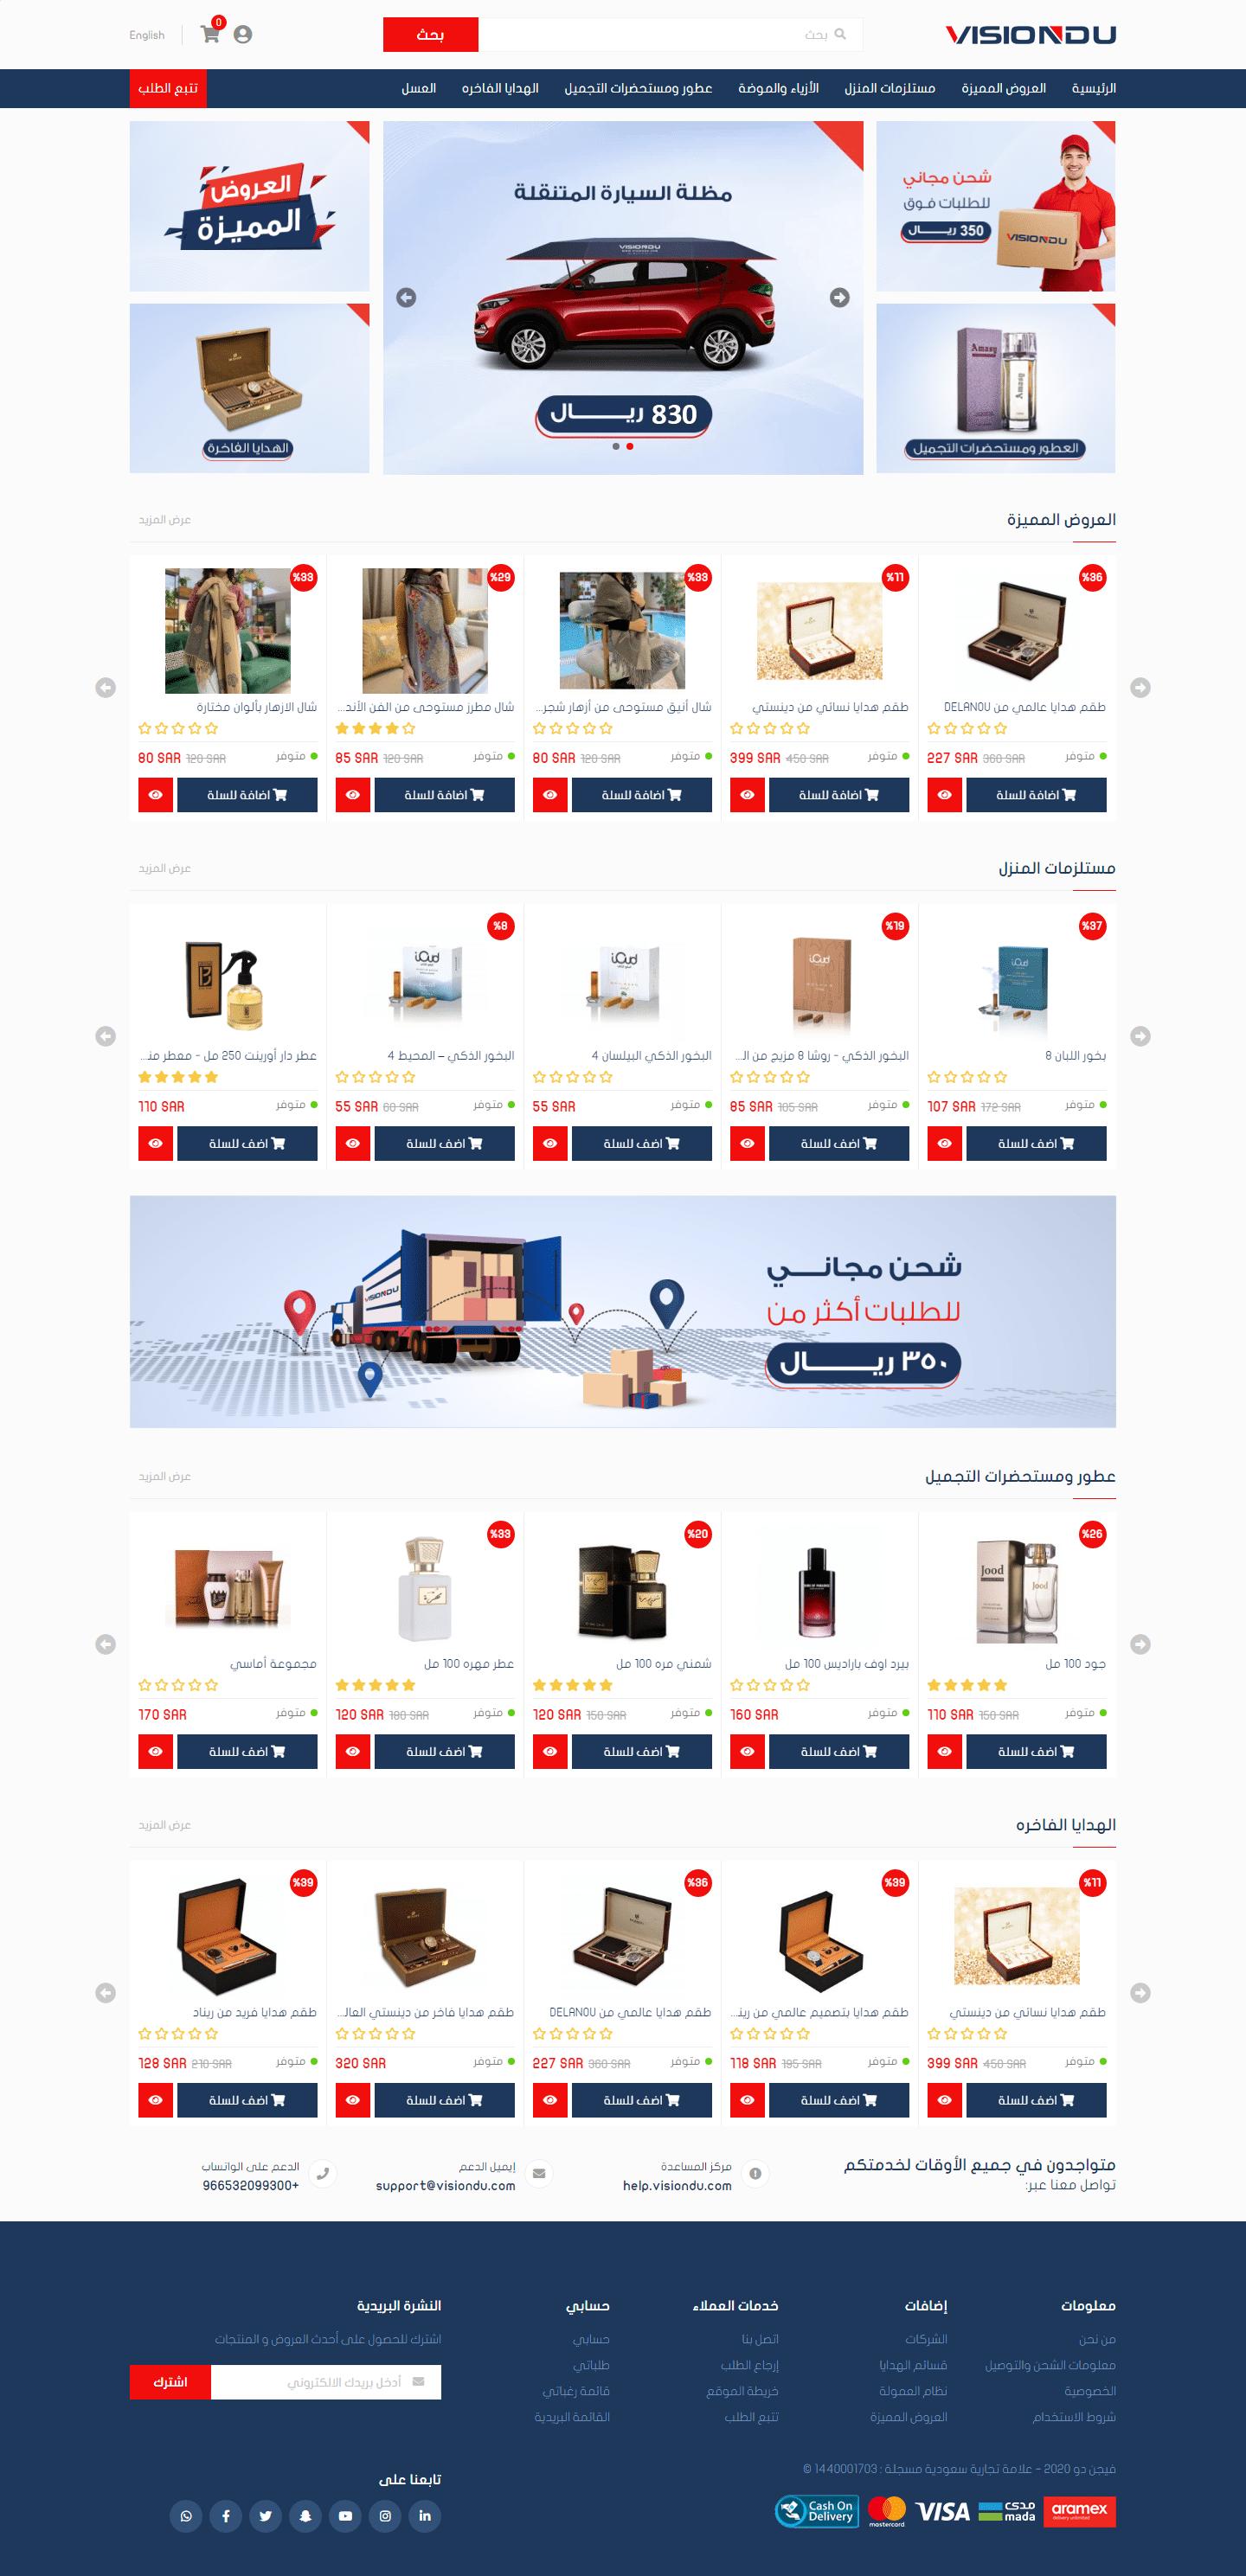 فيجن-دو-متجر-الكتروني-سعودي-متخصص-Visiondu-com